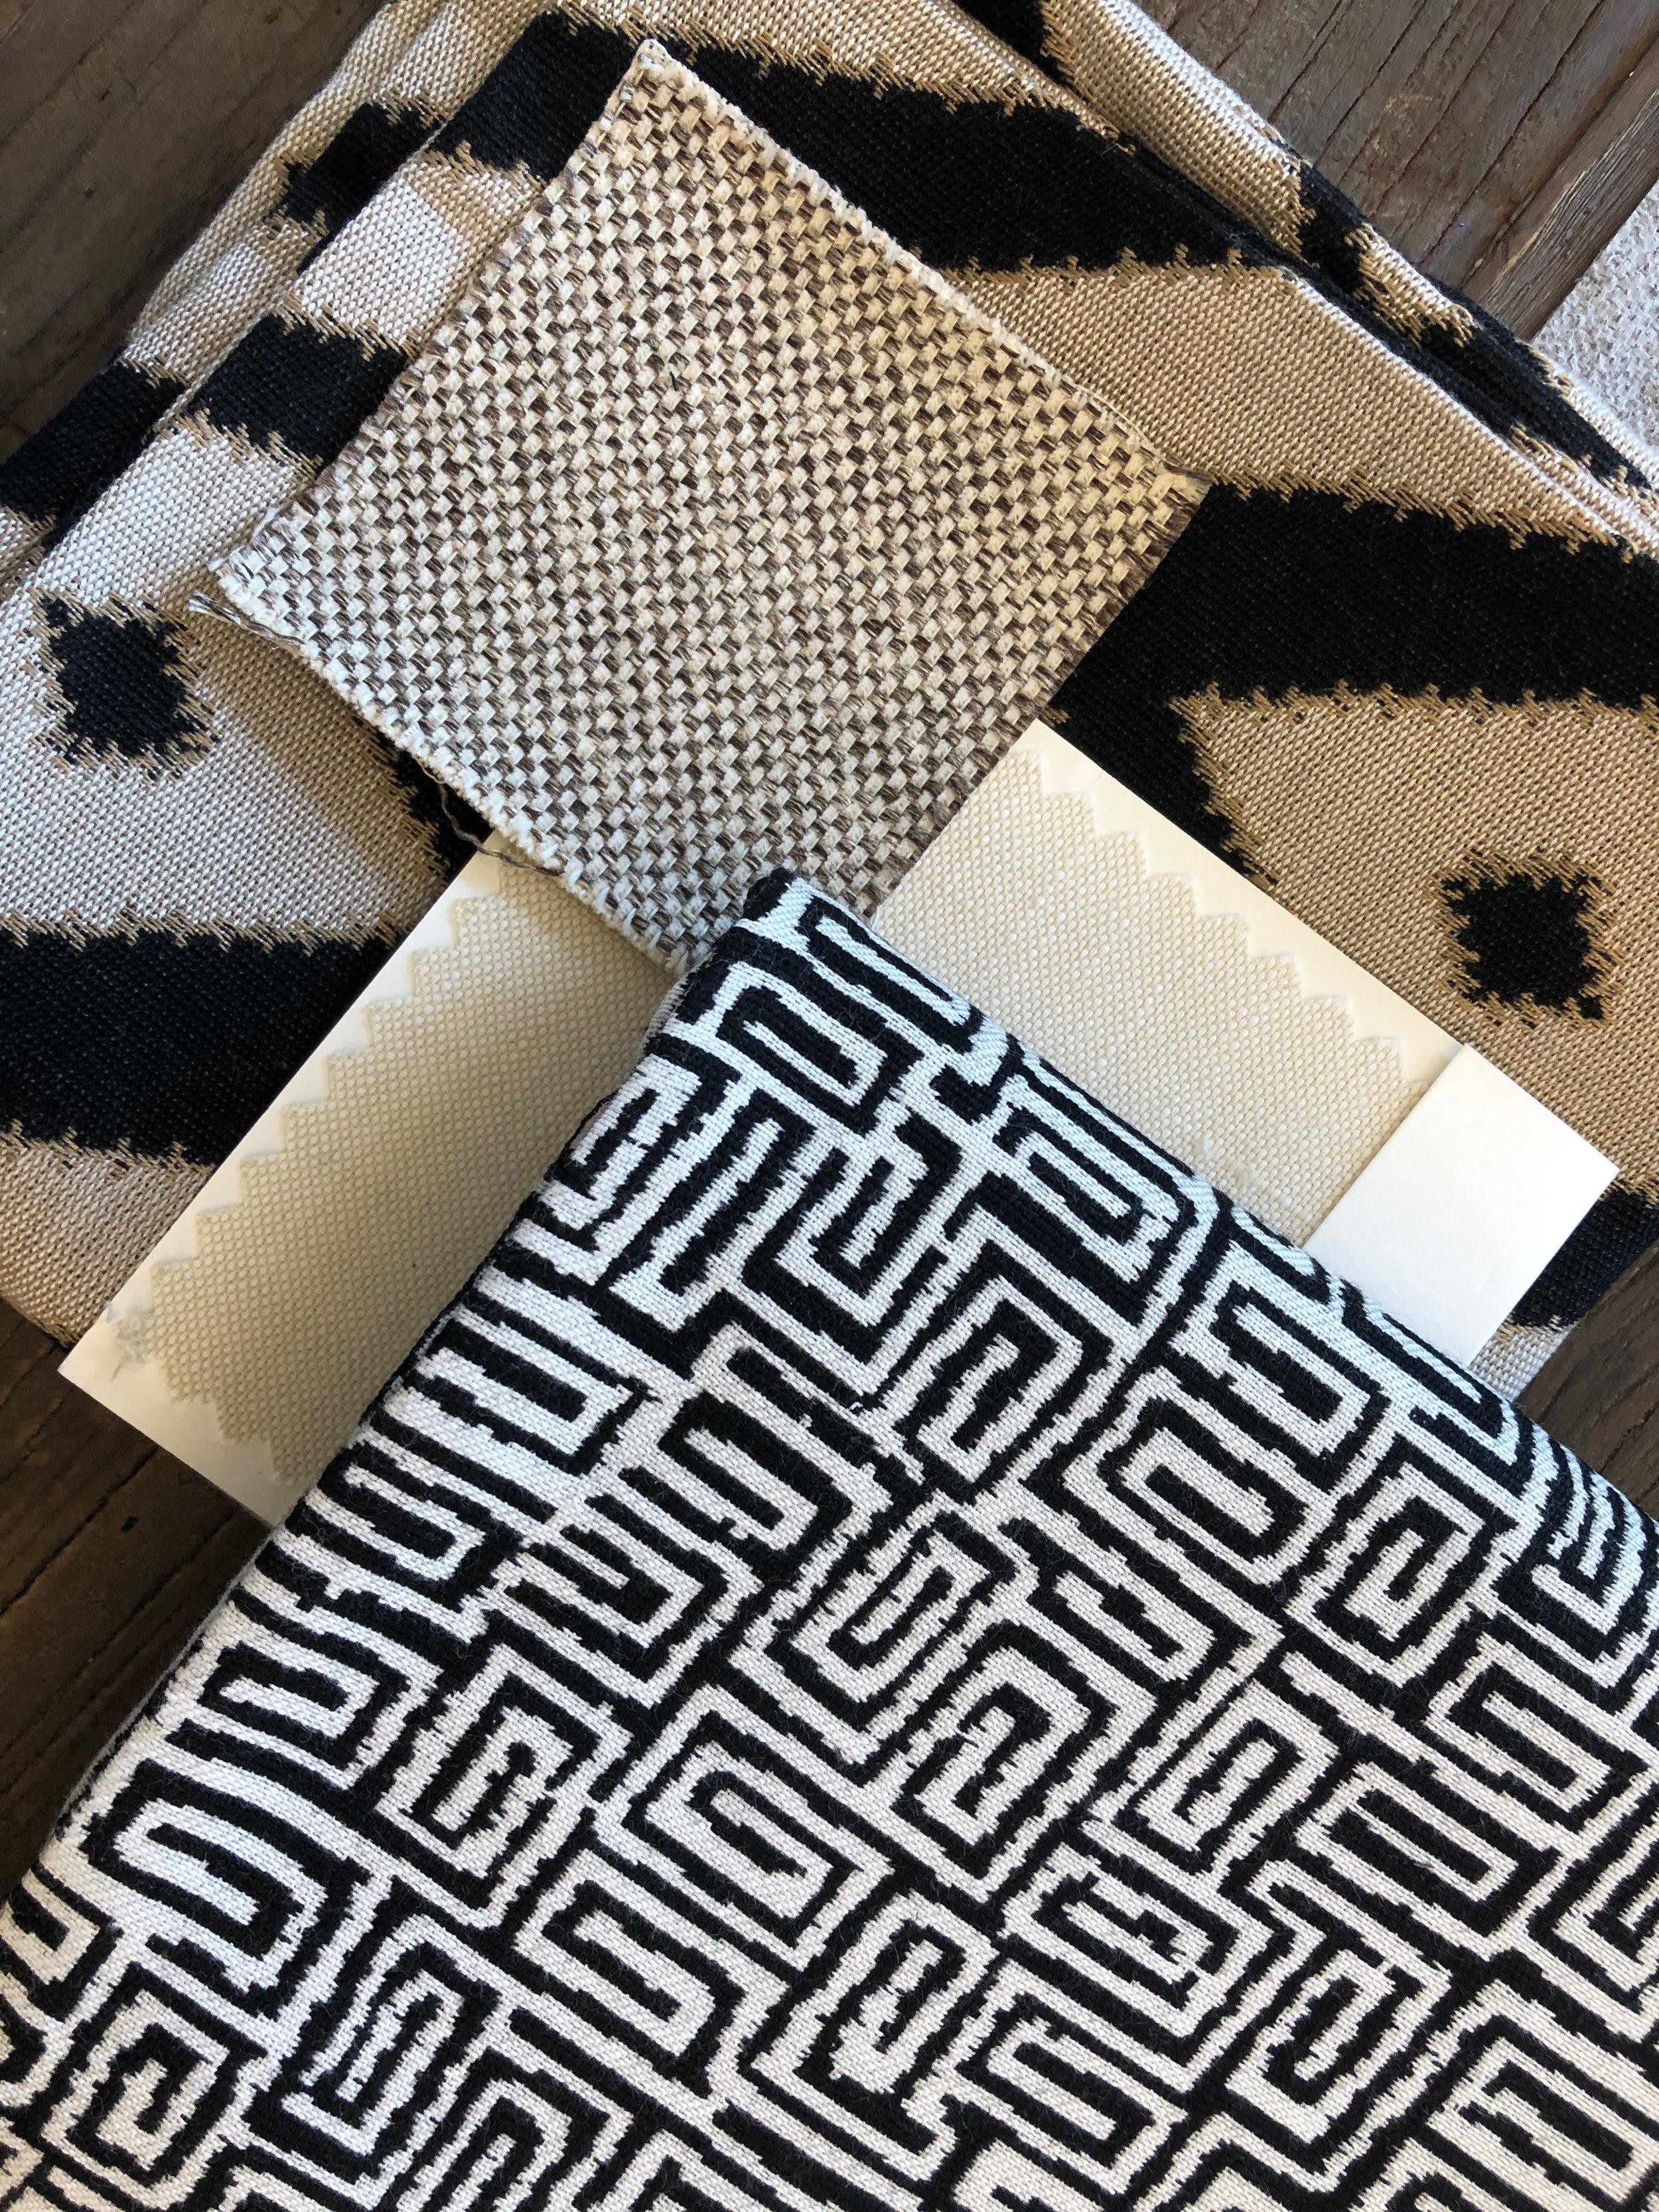 fabrics-outlookinn.JPG